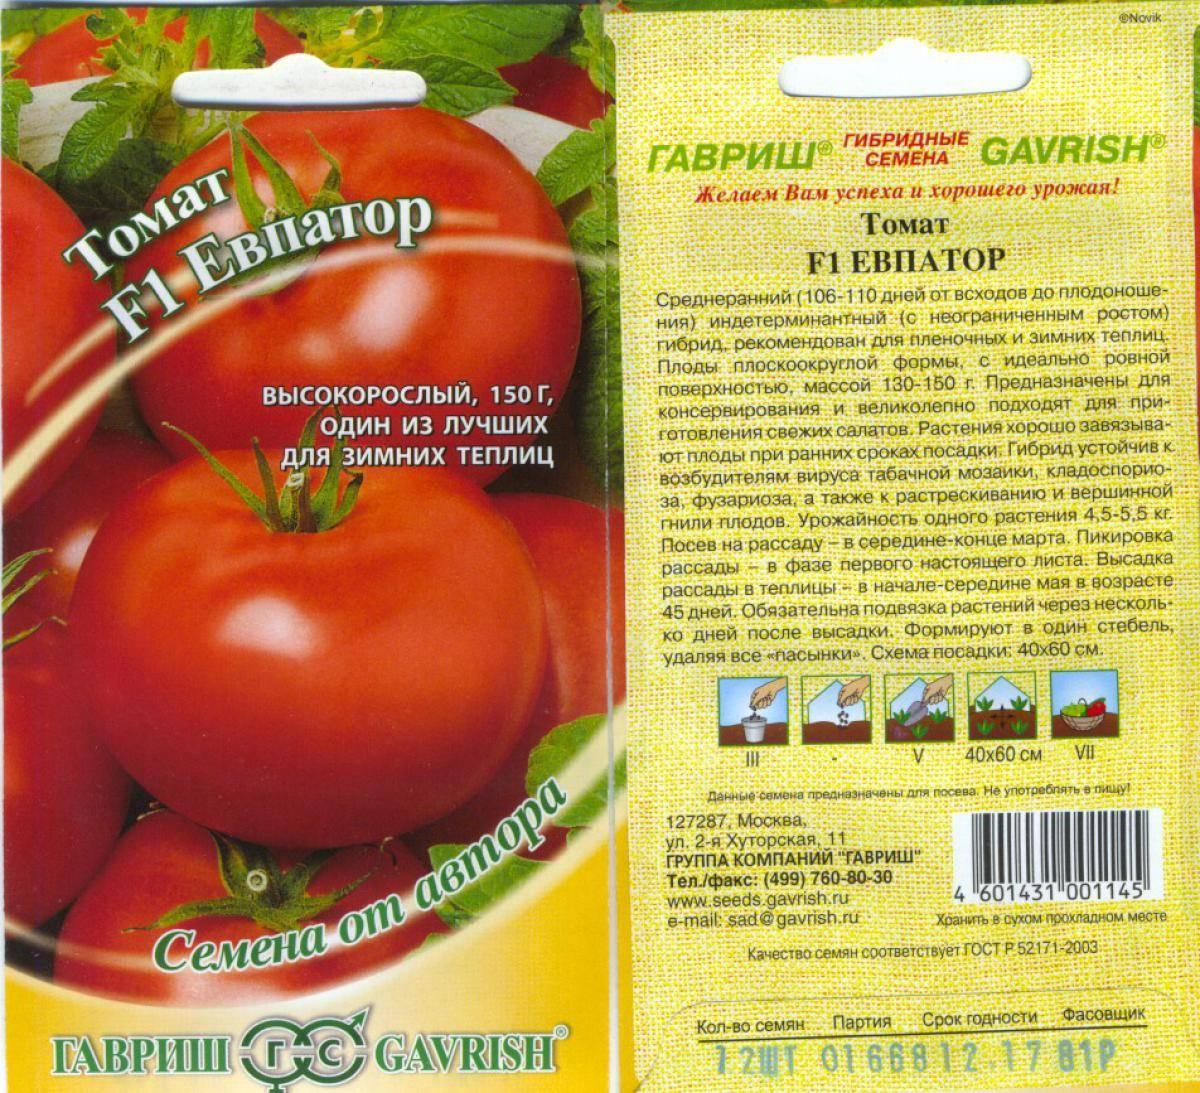 Гибрид евпатор из царства томатов